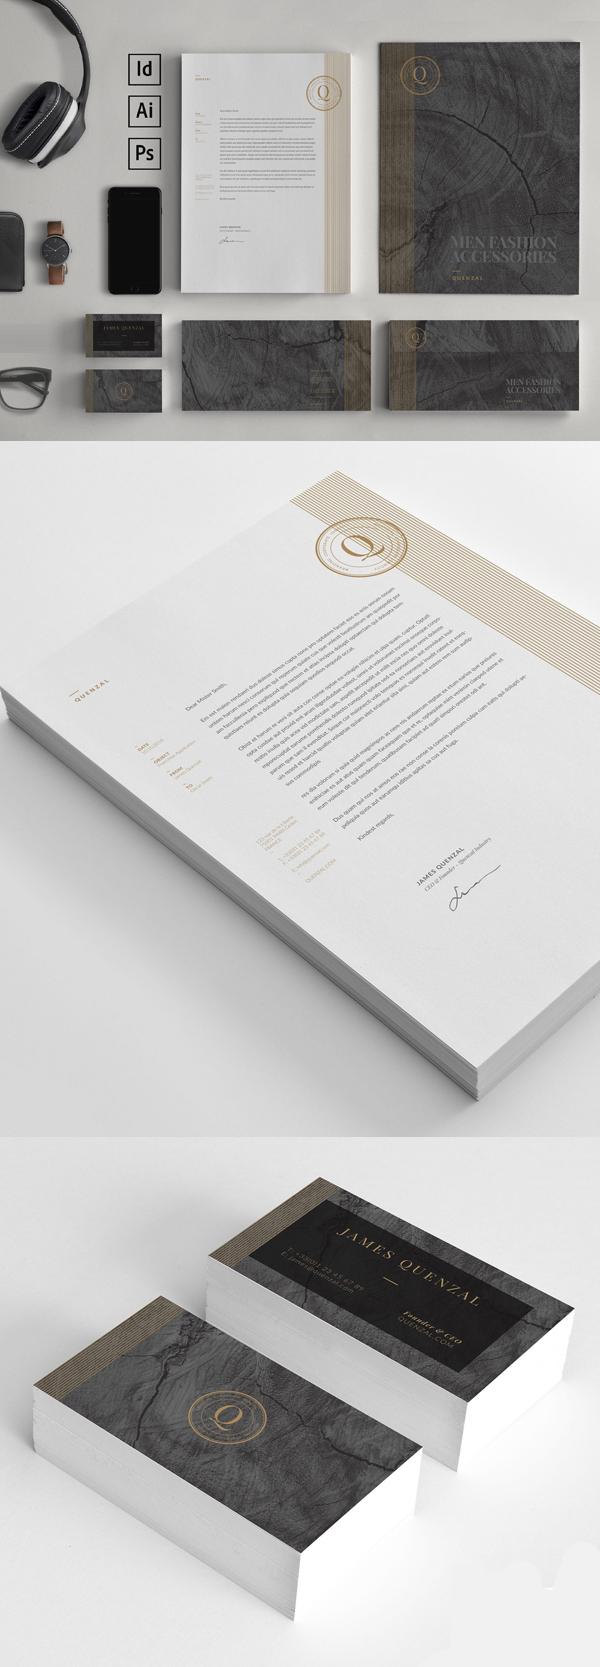 50 Professional Corporate Branding / Stationery Templates Design - 3